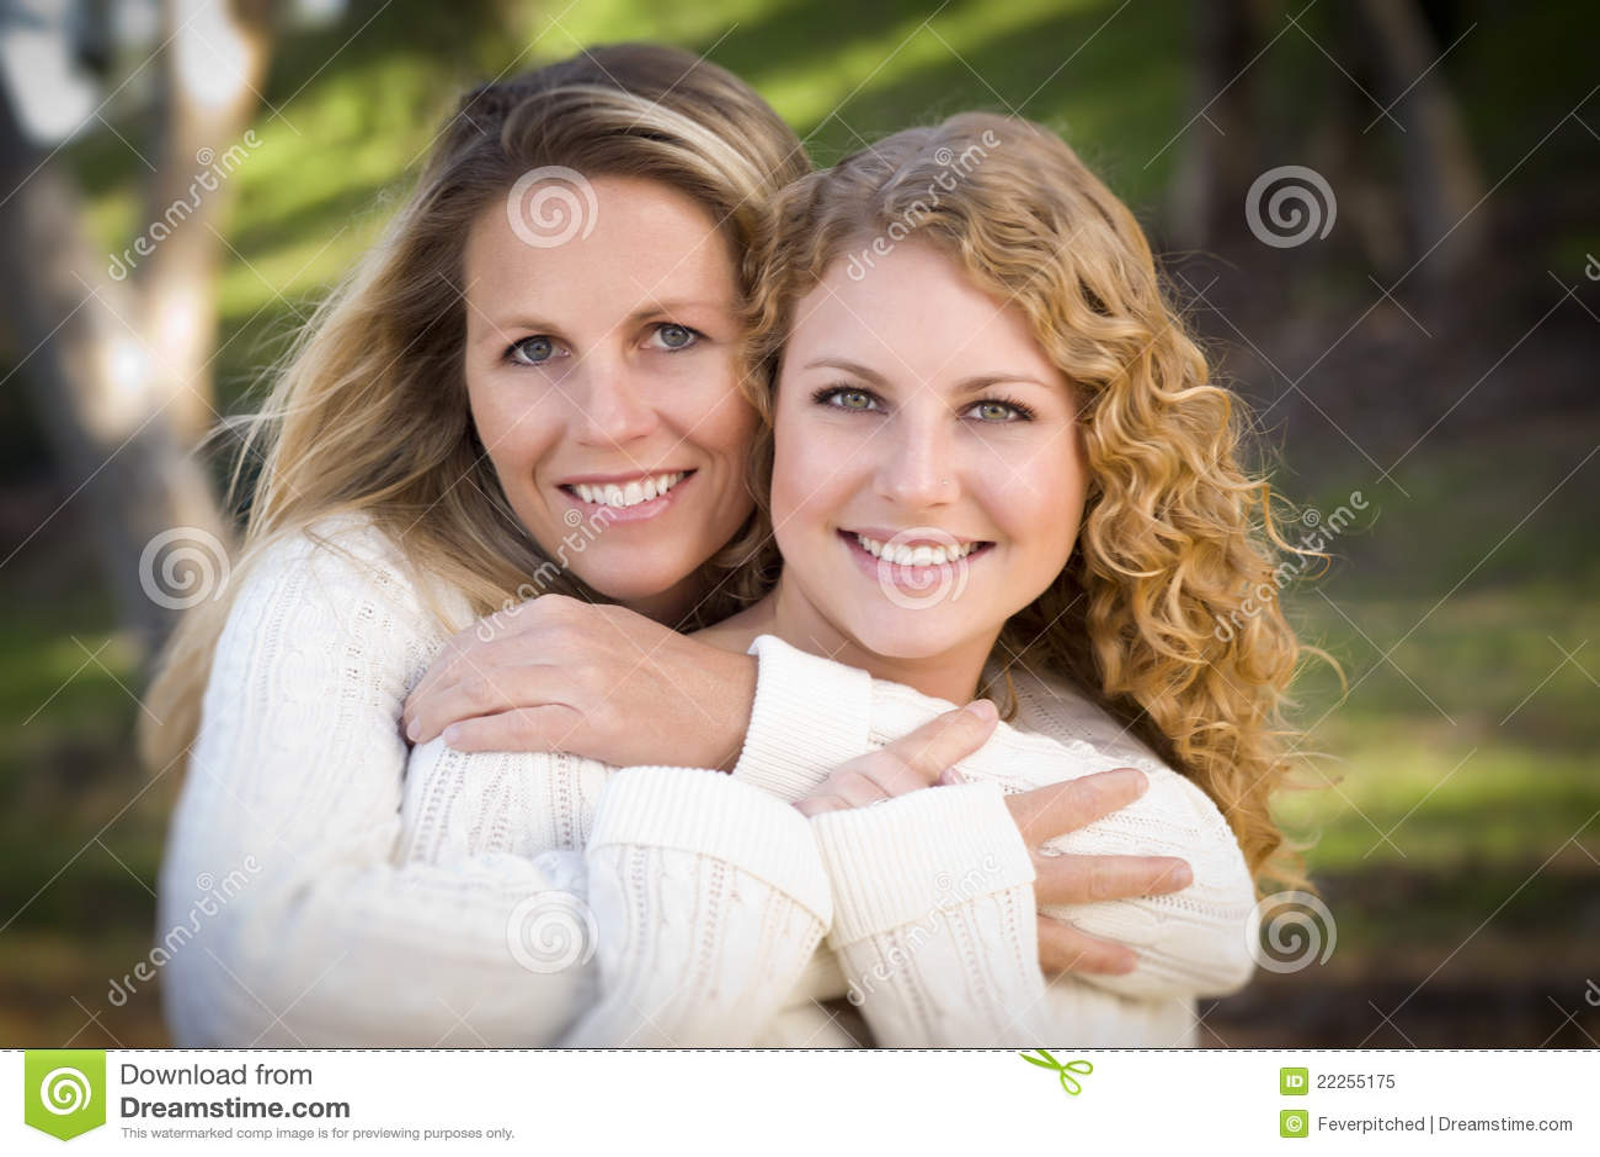 mat-i-doch-lesbiyanki-foto